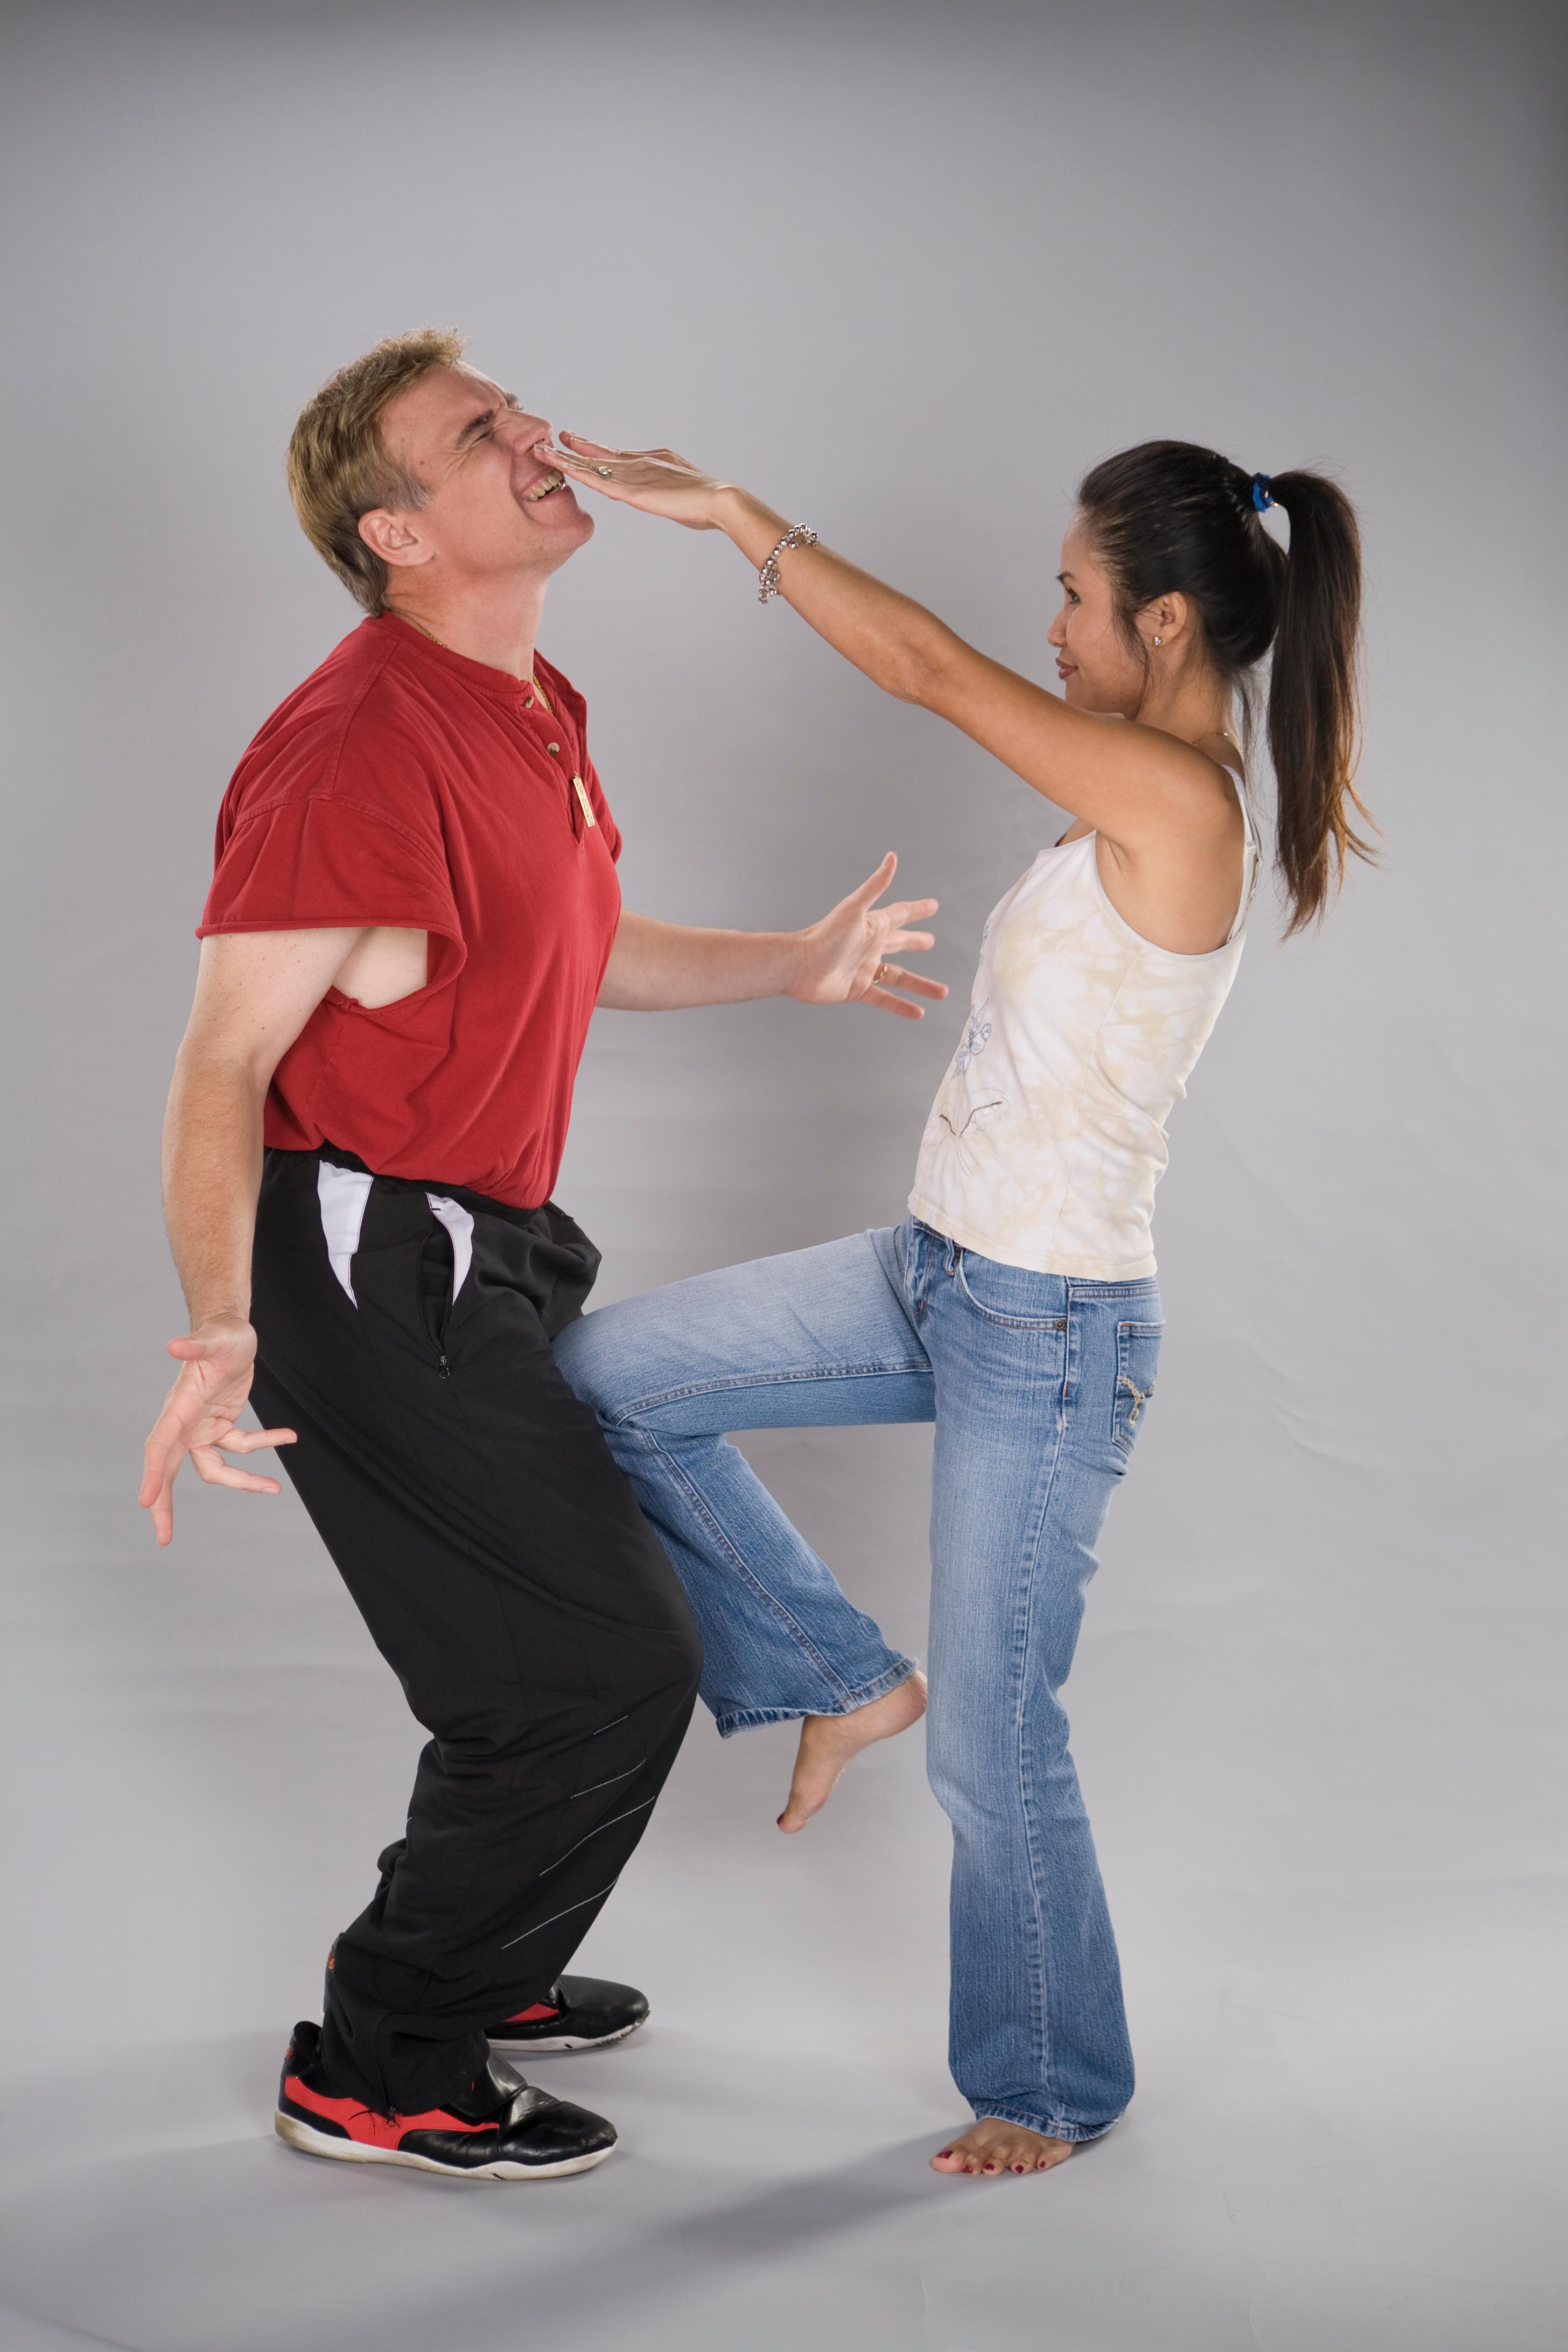 Self Defense For Women | www.imgkid.com - The Image Kid Has It!